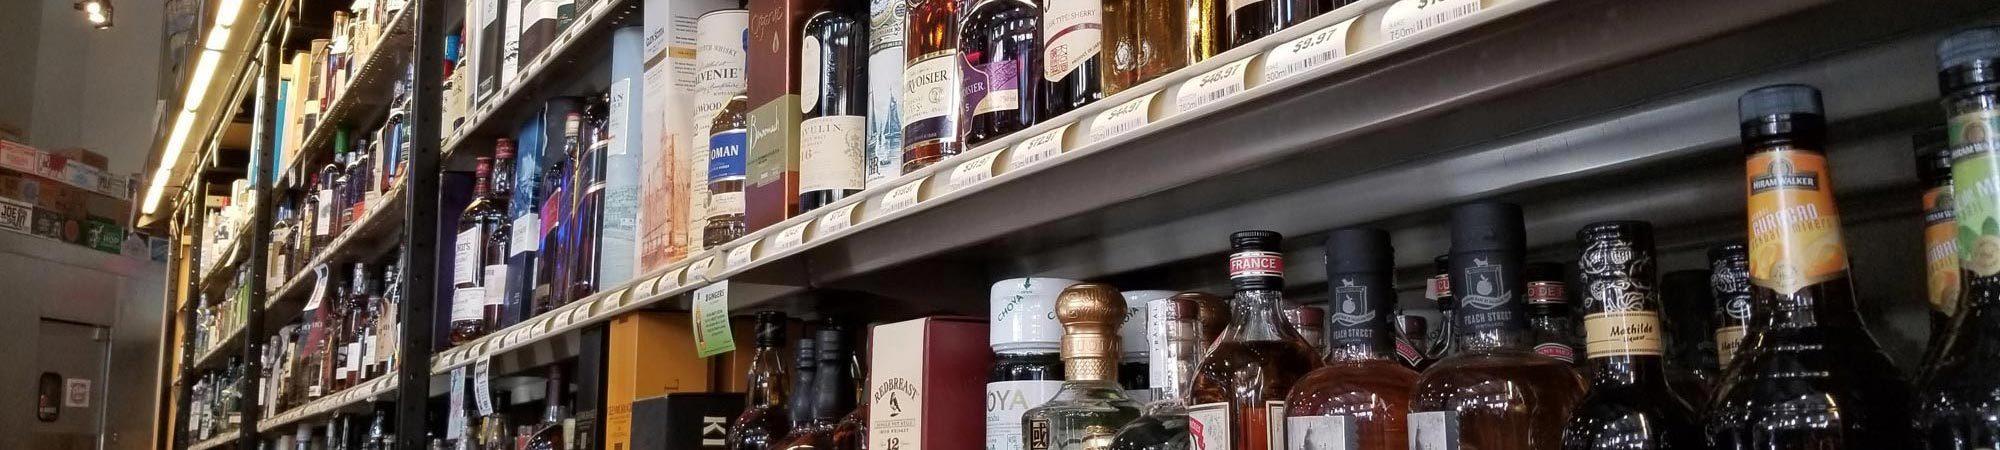 Liquor – Four Dogs Fine Wines & Spirits